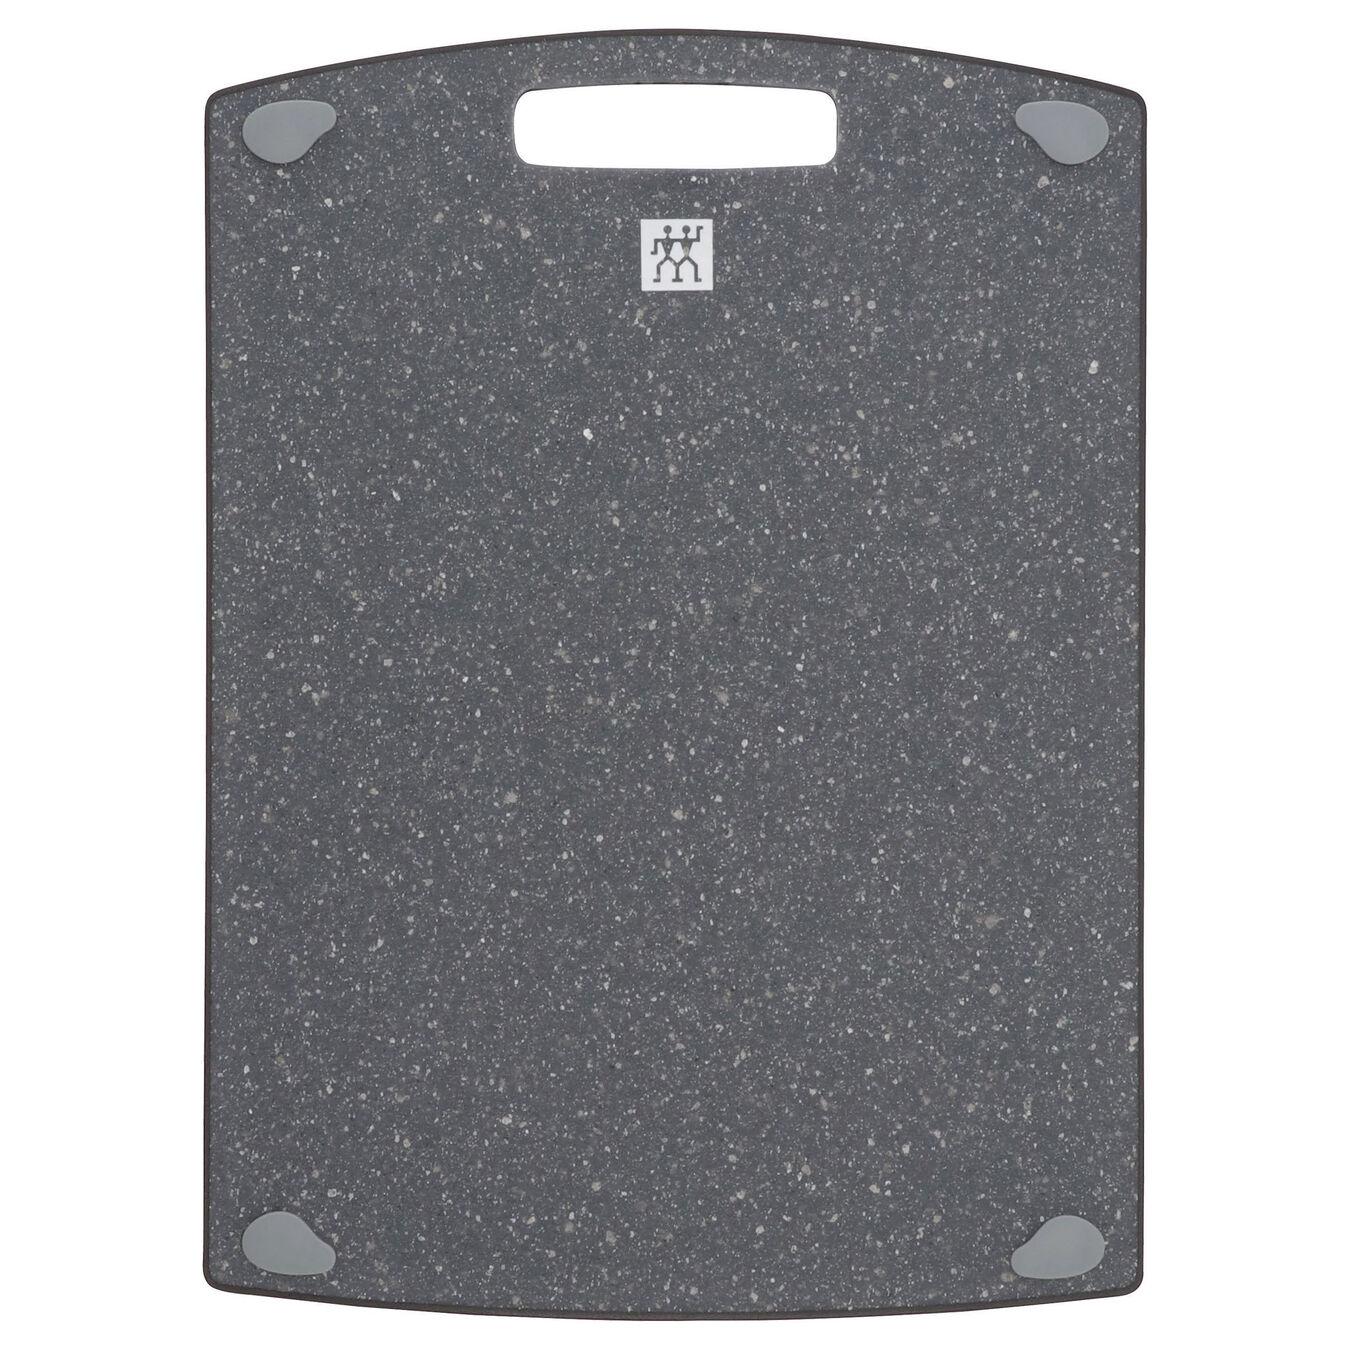 2 pc. Cutting board set, Plastic   36 cm x 20 cm & 37 cm x 27 cm 36 cm x 20 cm,,large 4